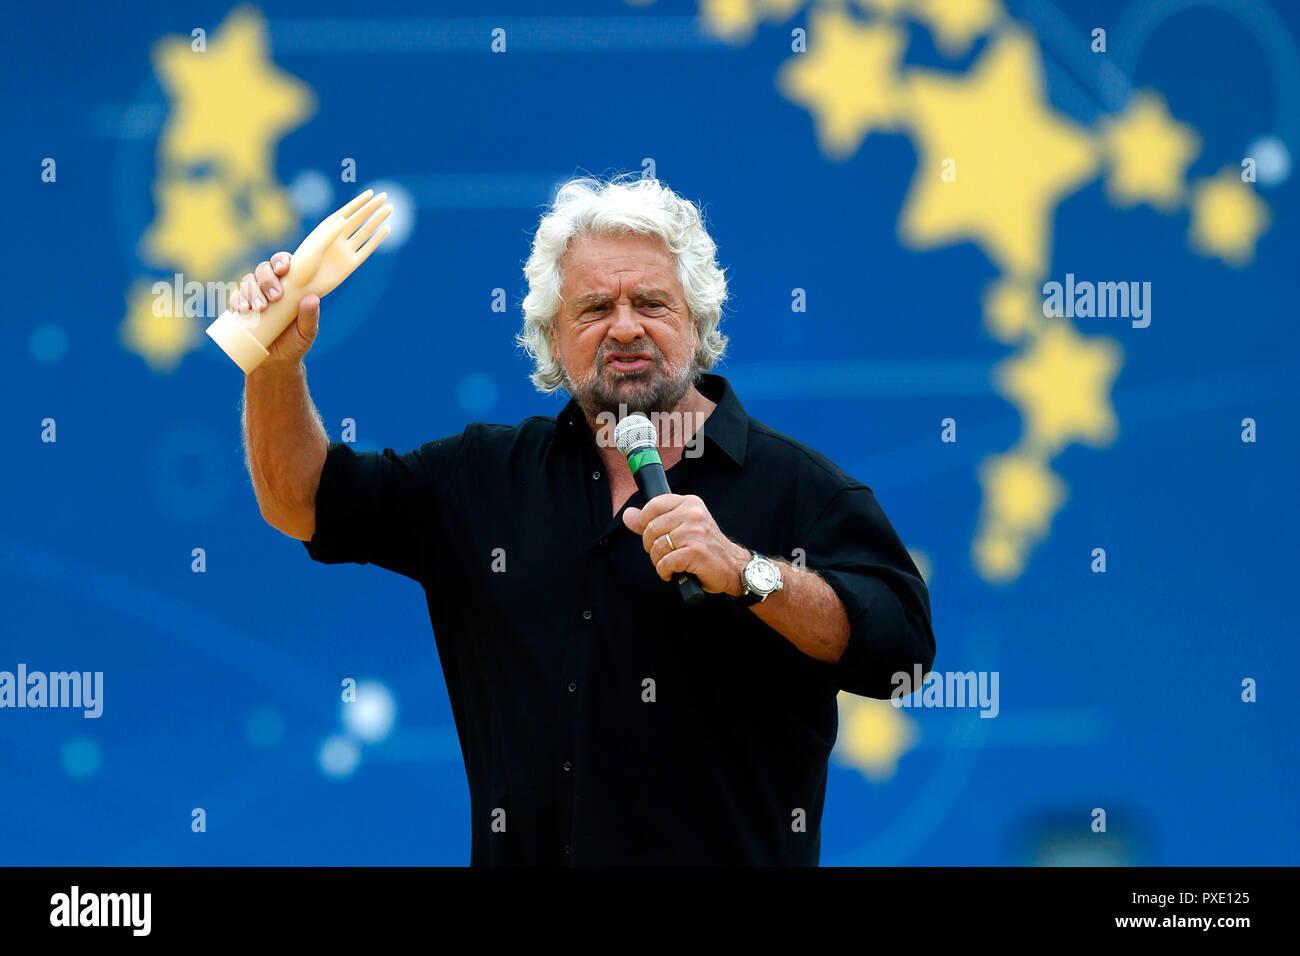 Beppe Grillo Roma 21/10/2018. El Circo Massimo. Convención evento Italia 5 Stelle. Roma, 21 de octubre de 2018. Convenio 'Italia 5 Estrellas'. Foto Samantha Zucchi Insidefoto Imagen De Stock